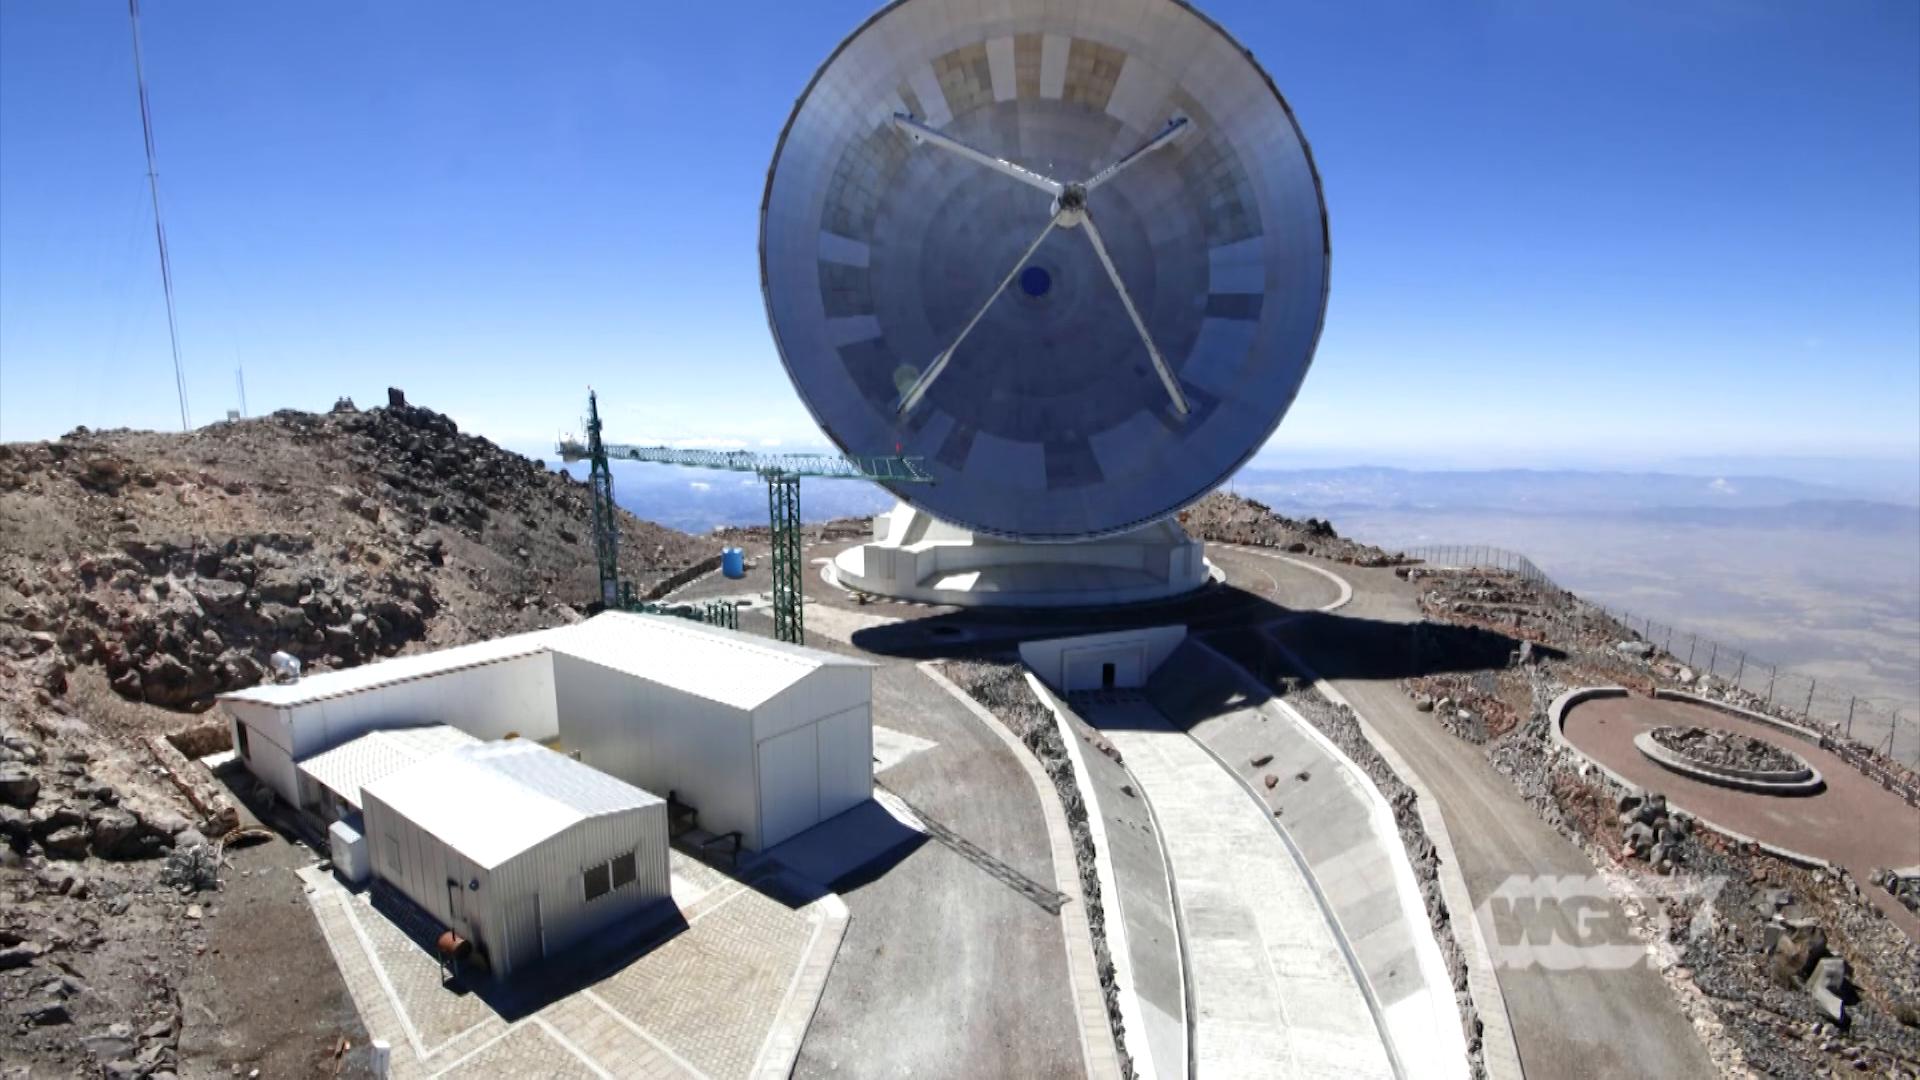 UMass Amherst Team Helps Capture First Black Hole Image